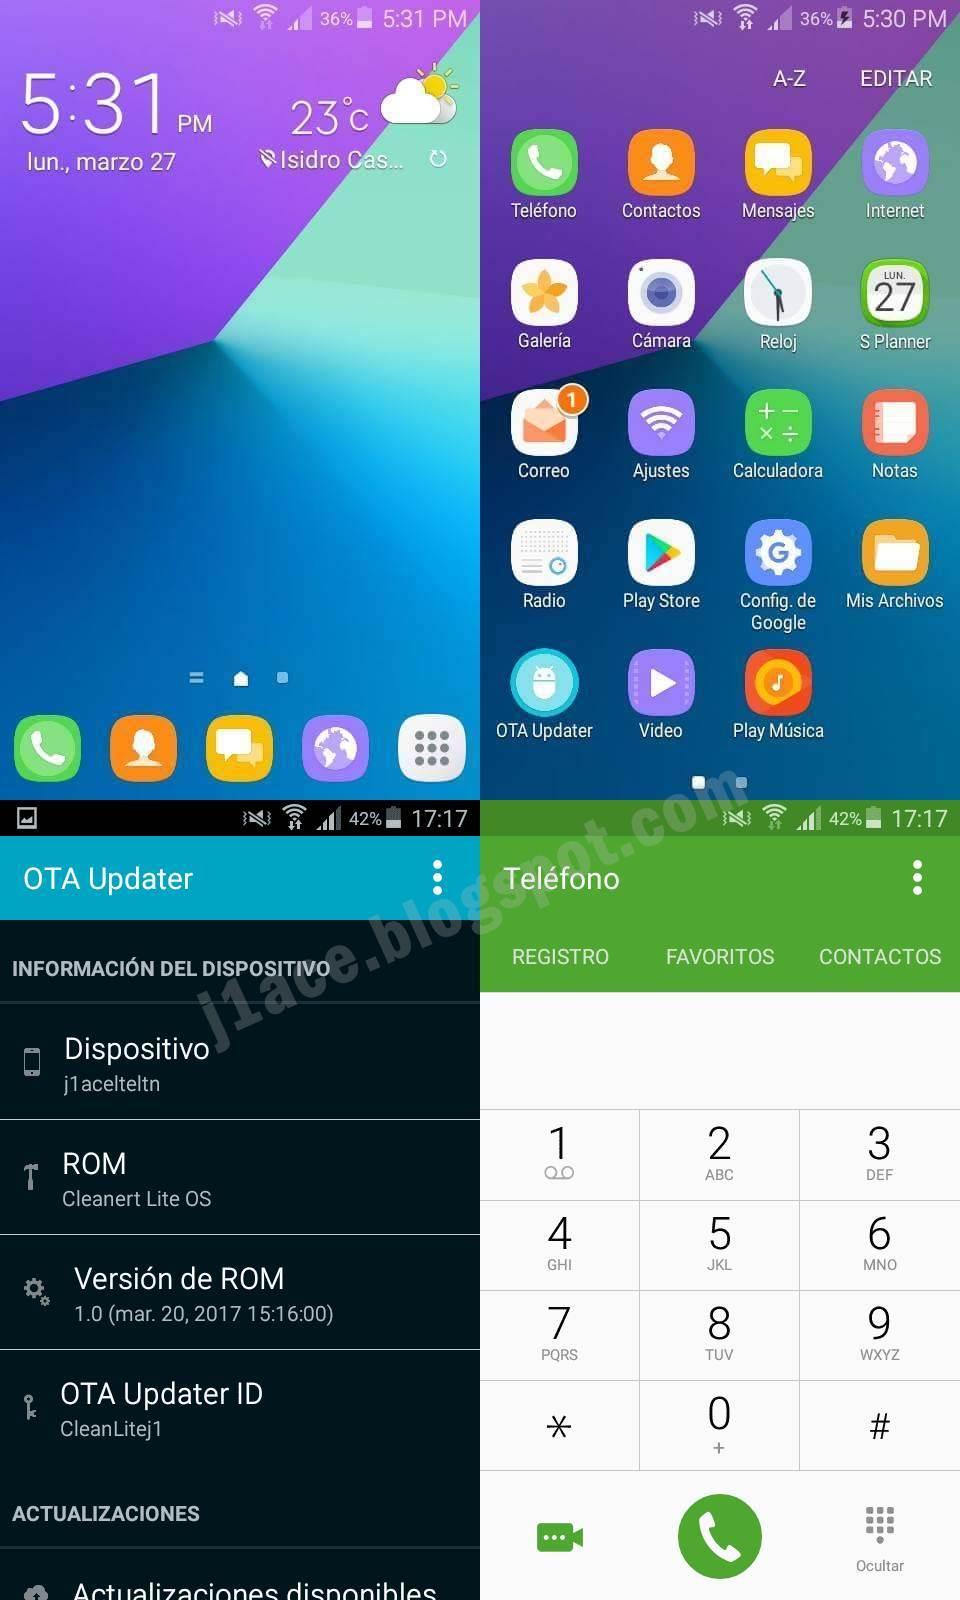 Custom Rom CleanertLite OS For Galaxy J1 ACE SM-J110M [5.1.1] - J1 ...